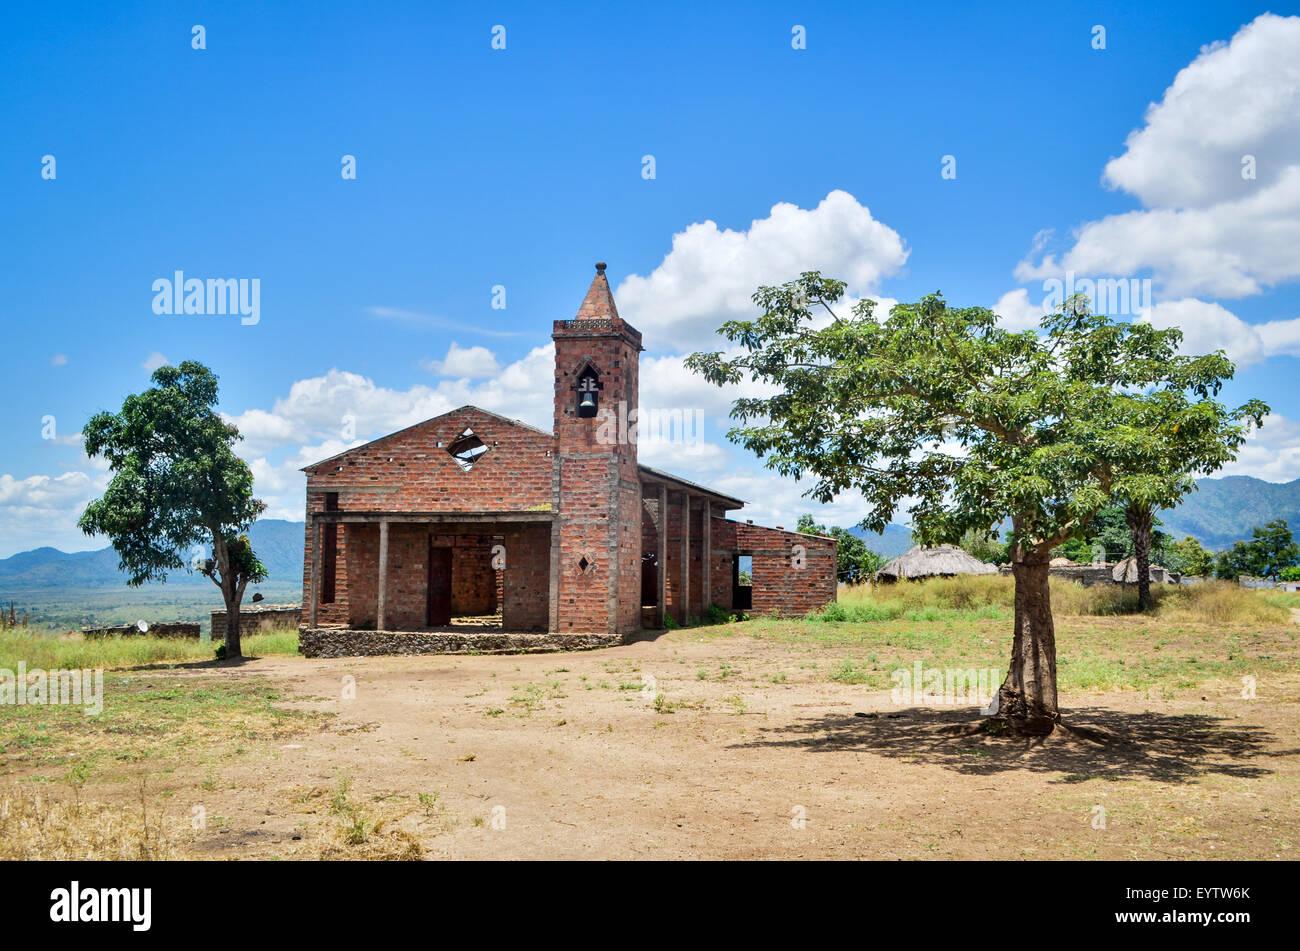 Ruins of a church near Catanda, in rural Angola - Stock Image